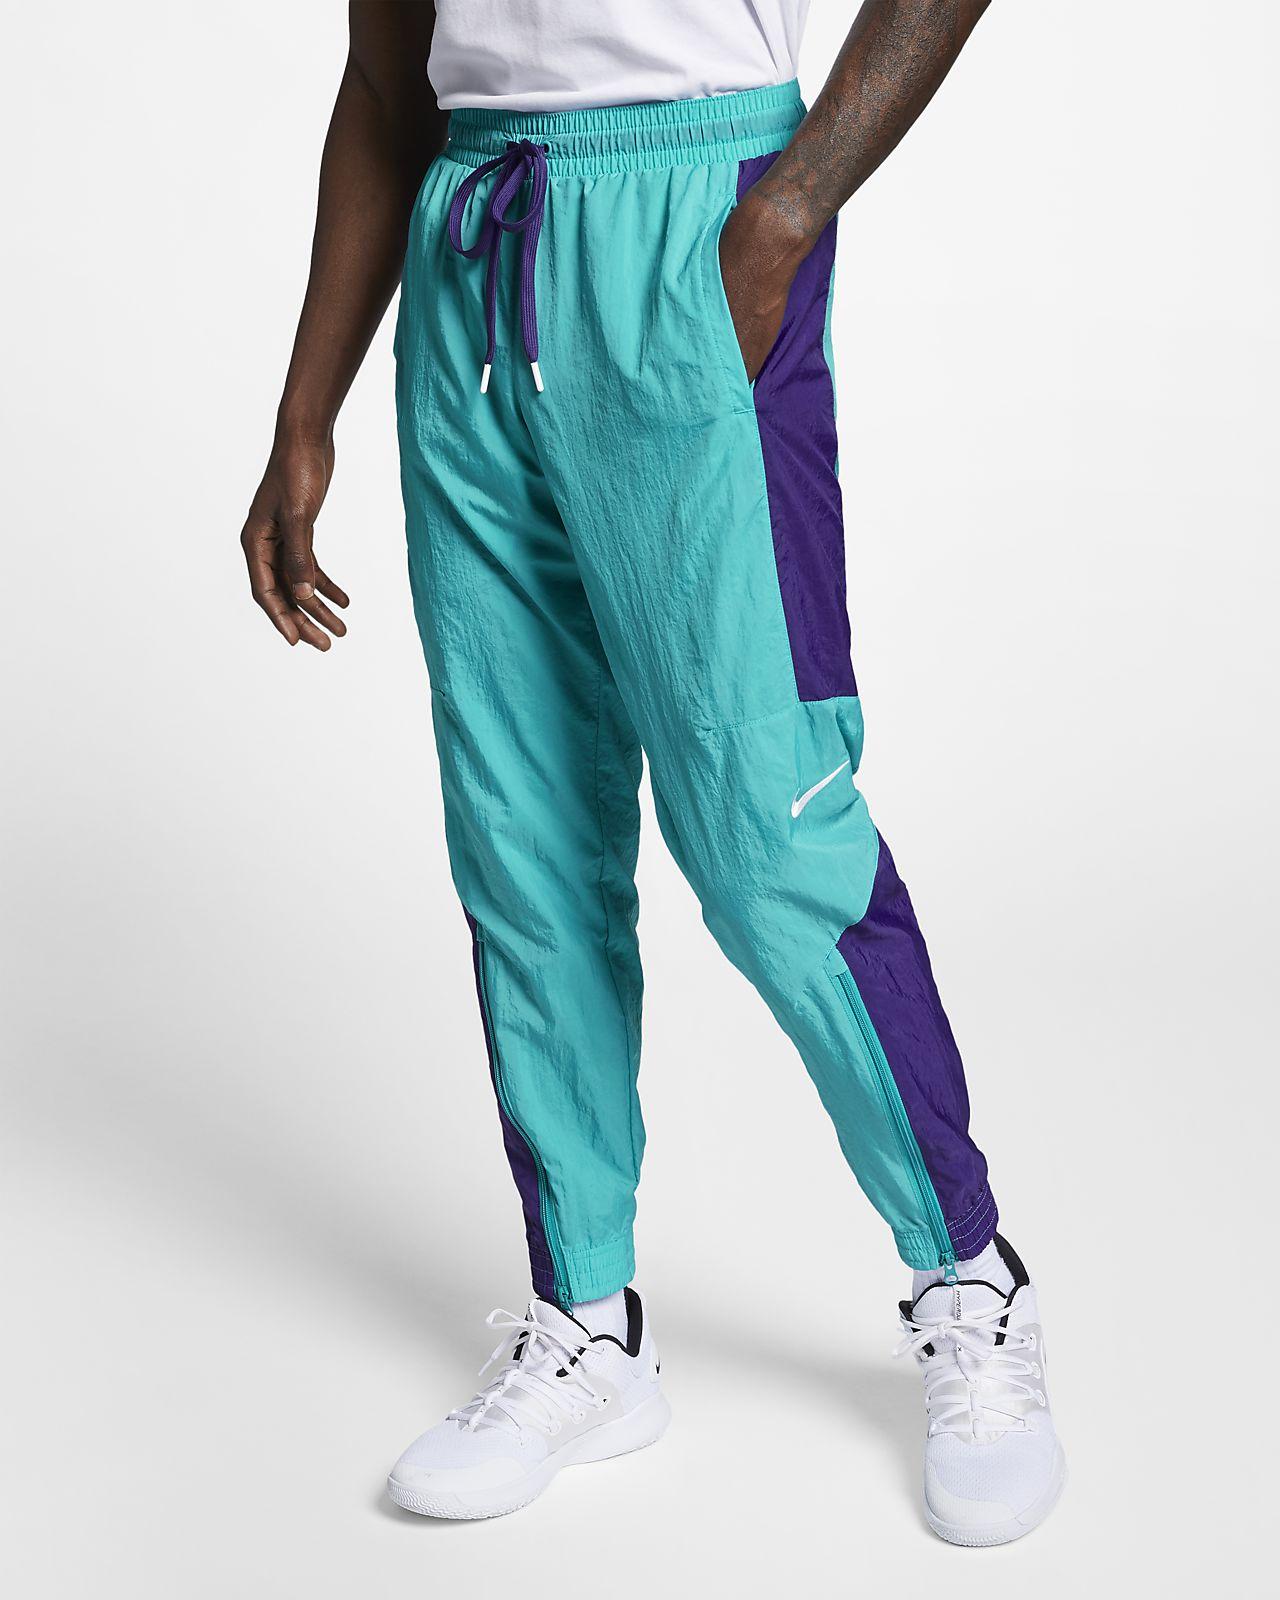 0d402abd9c62 Low Resolution Nike Basketball Pants Nike Basketball Pants